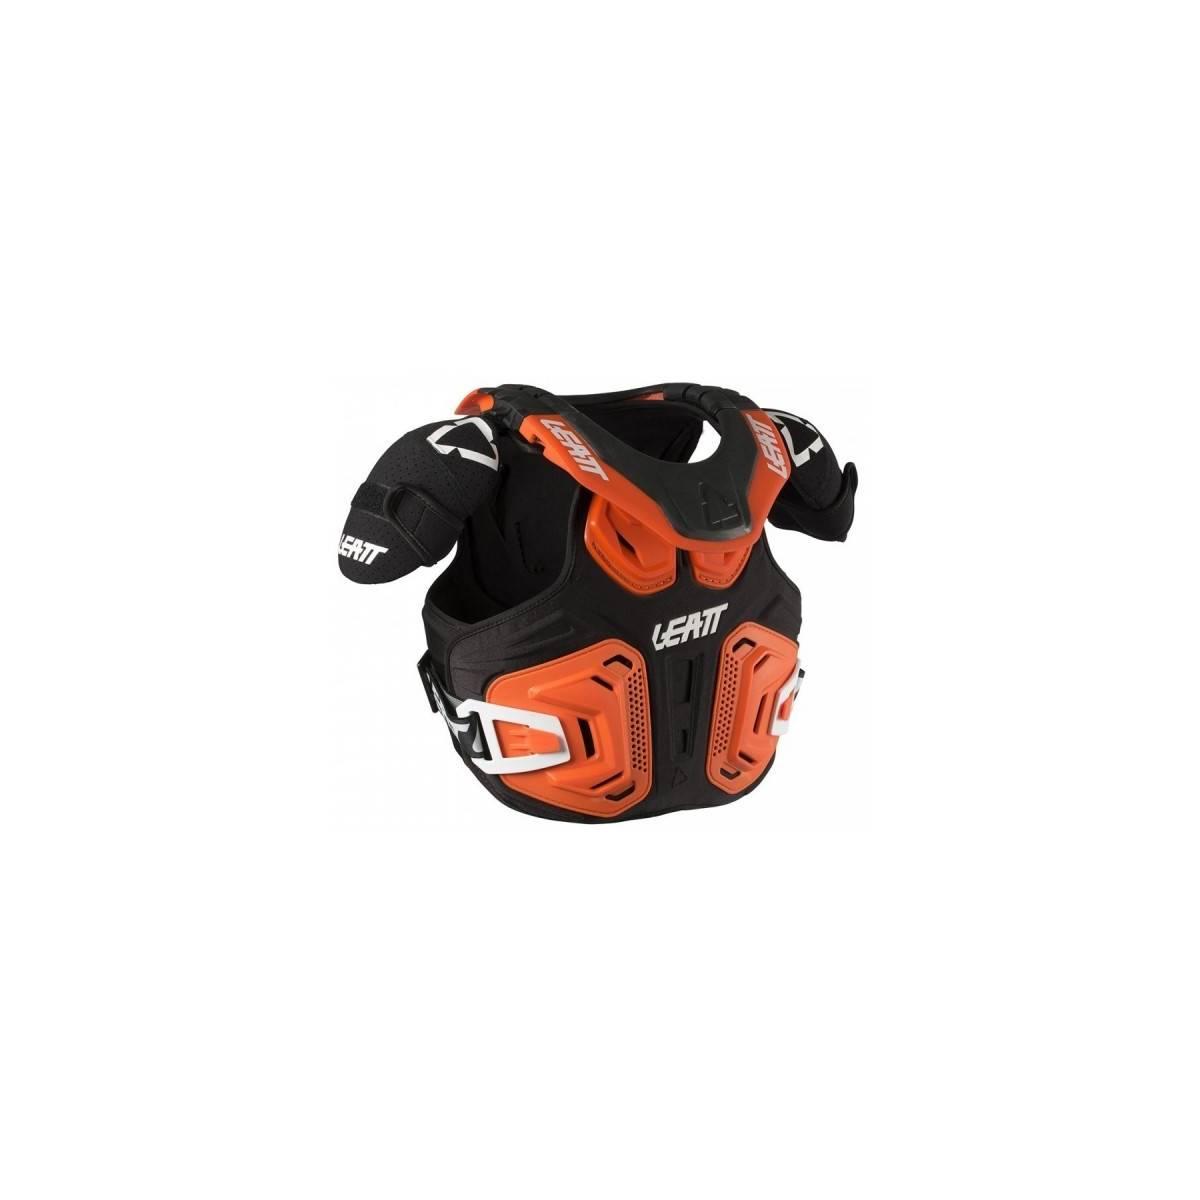 LB101801002 - Peto Collarin Fusion 2.0 Junior Leatt Brace Naranja Negro